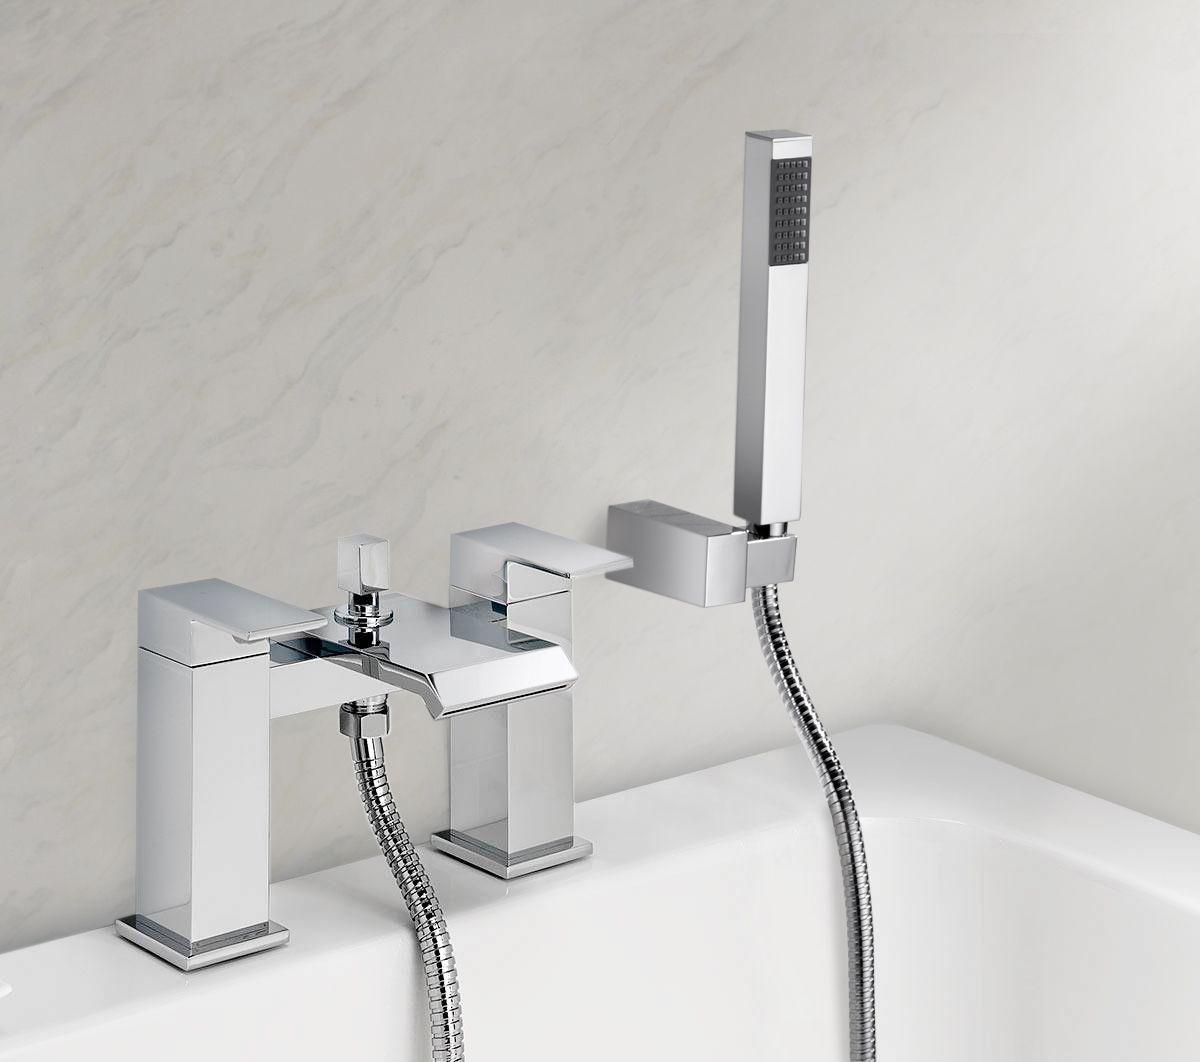 Tec Studio Q Waterfall Bath Shower Mixer Tap  Brand - Synergy  Ceramic  disc cartridge